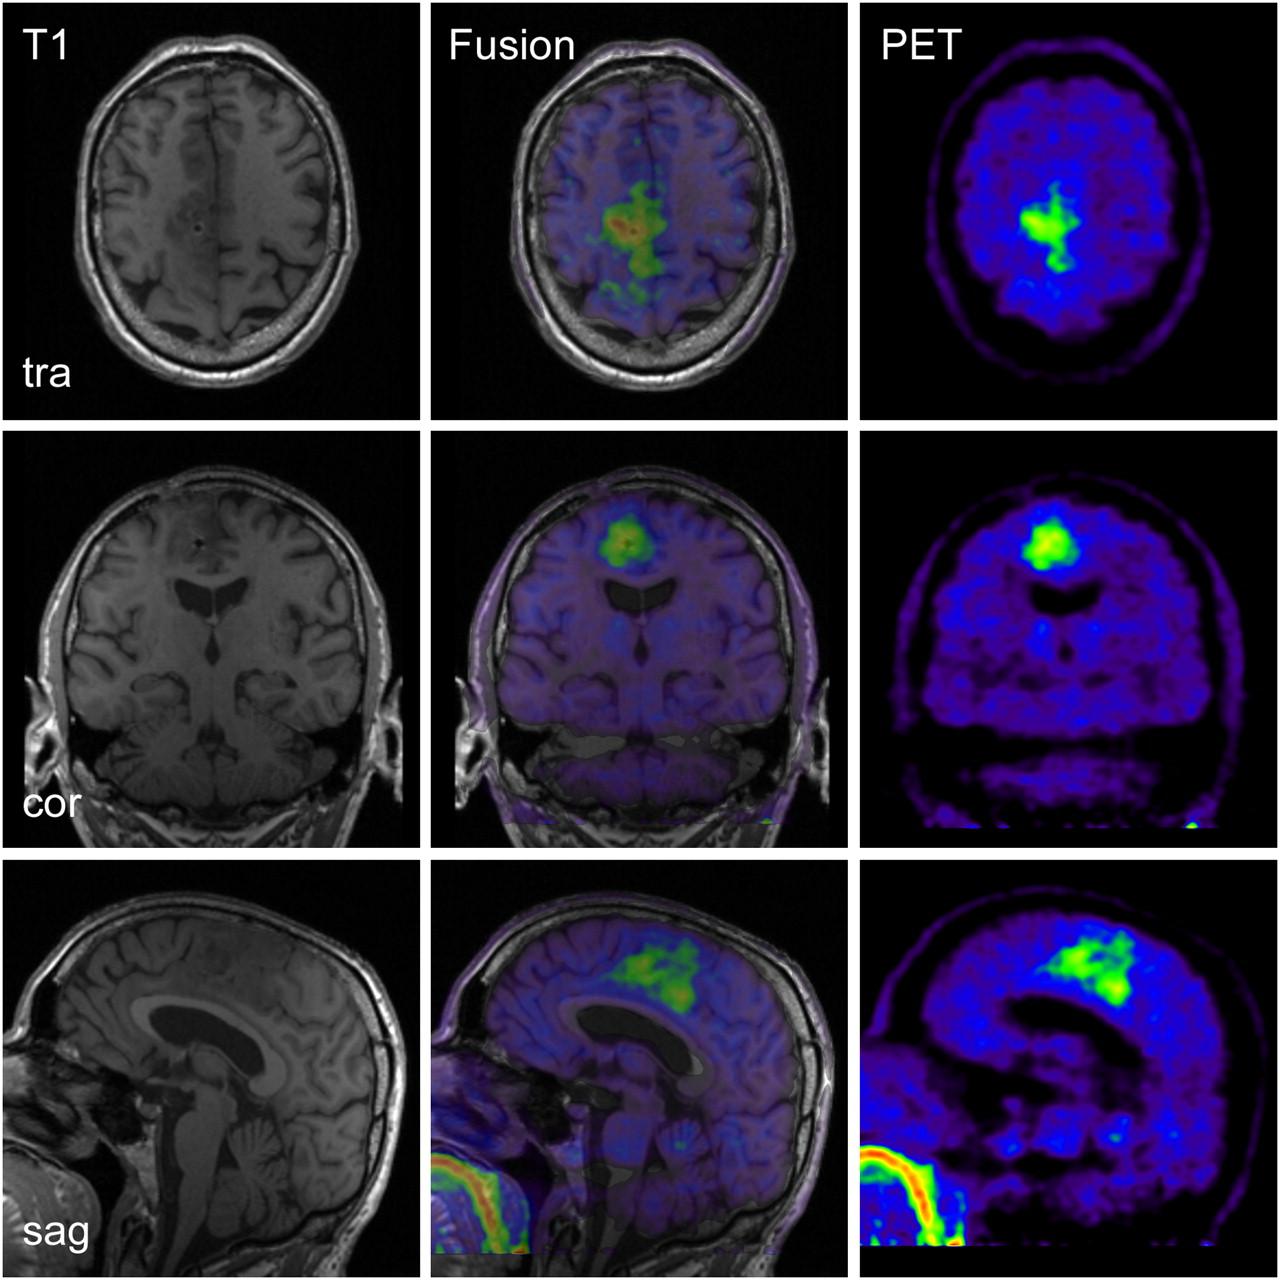 Hybrid PET/MRI of Intracranial Masses: Initial Experiences